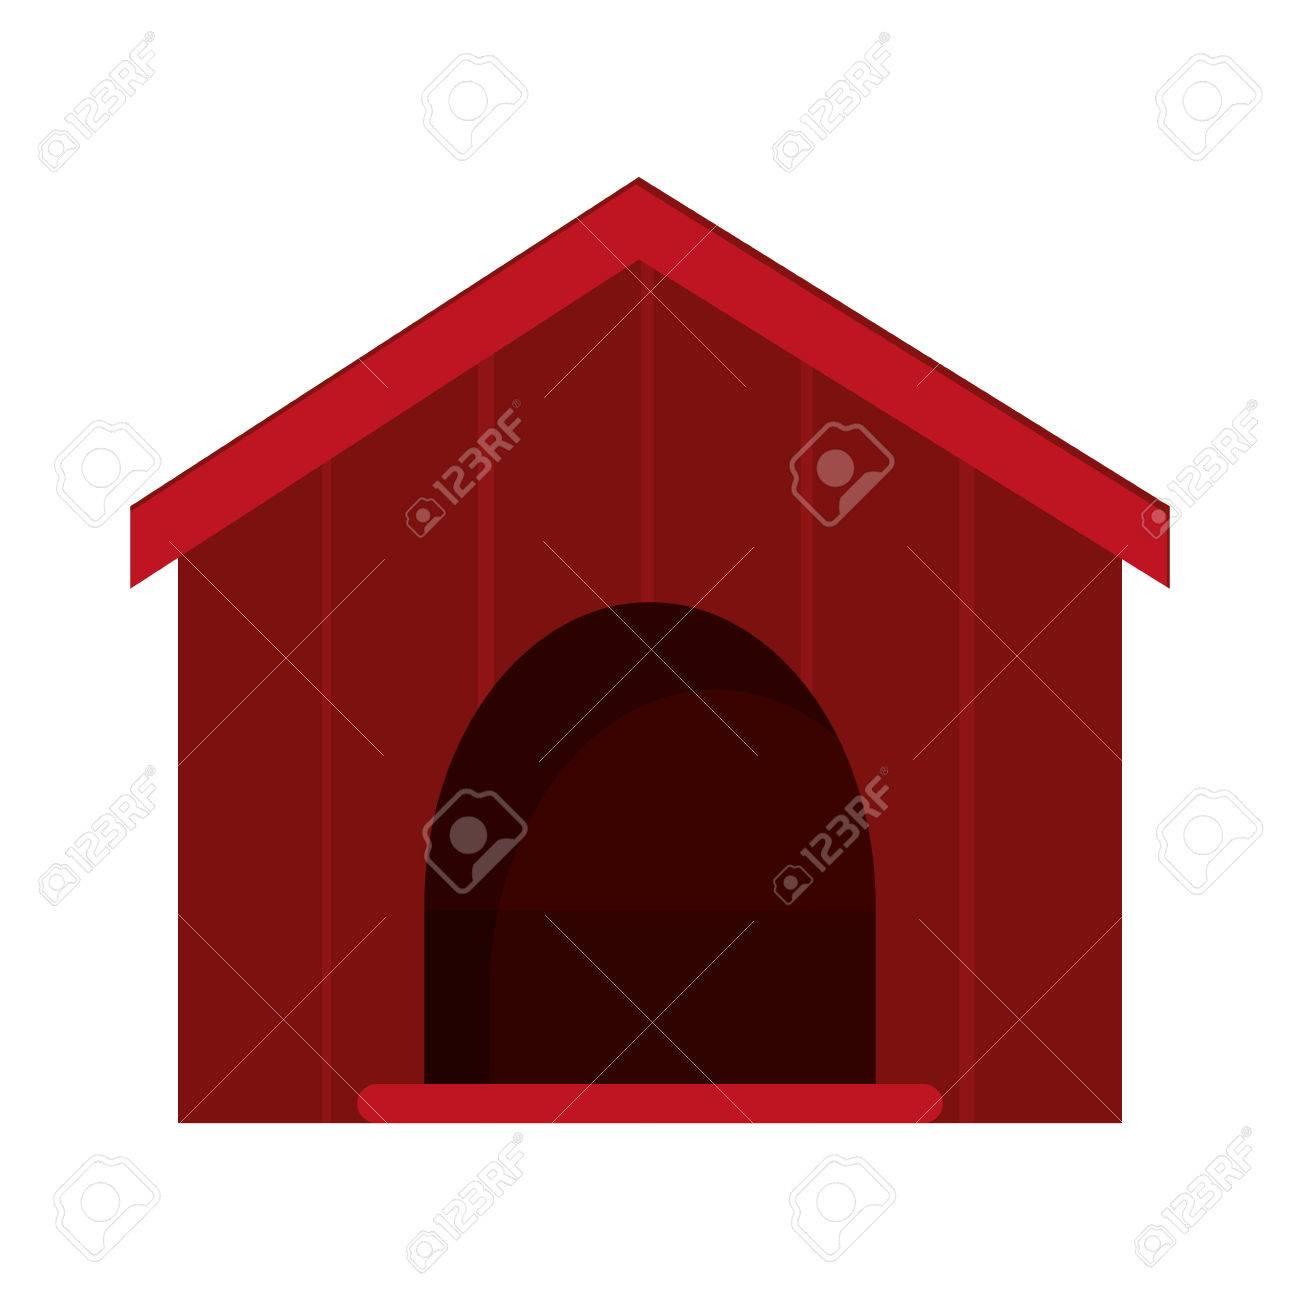 1300x1300 Flat Design Dog House Icon Vector Illustration Royalty Free